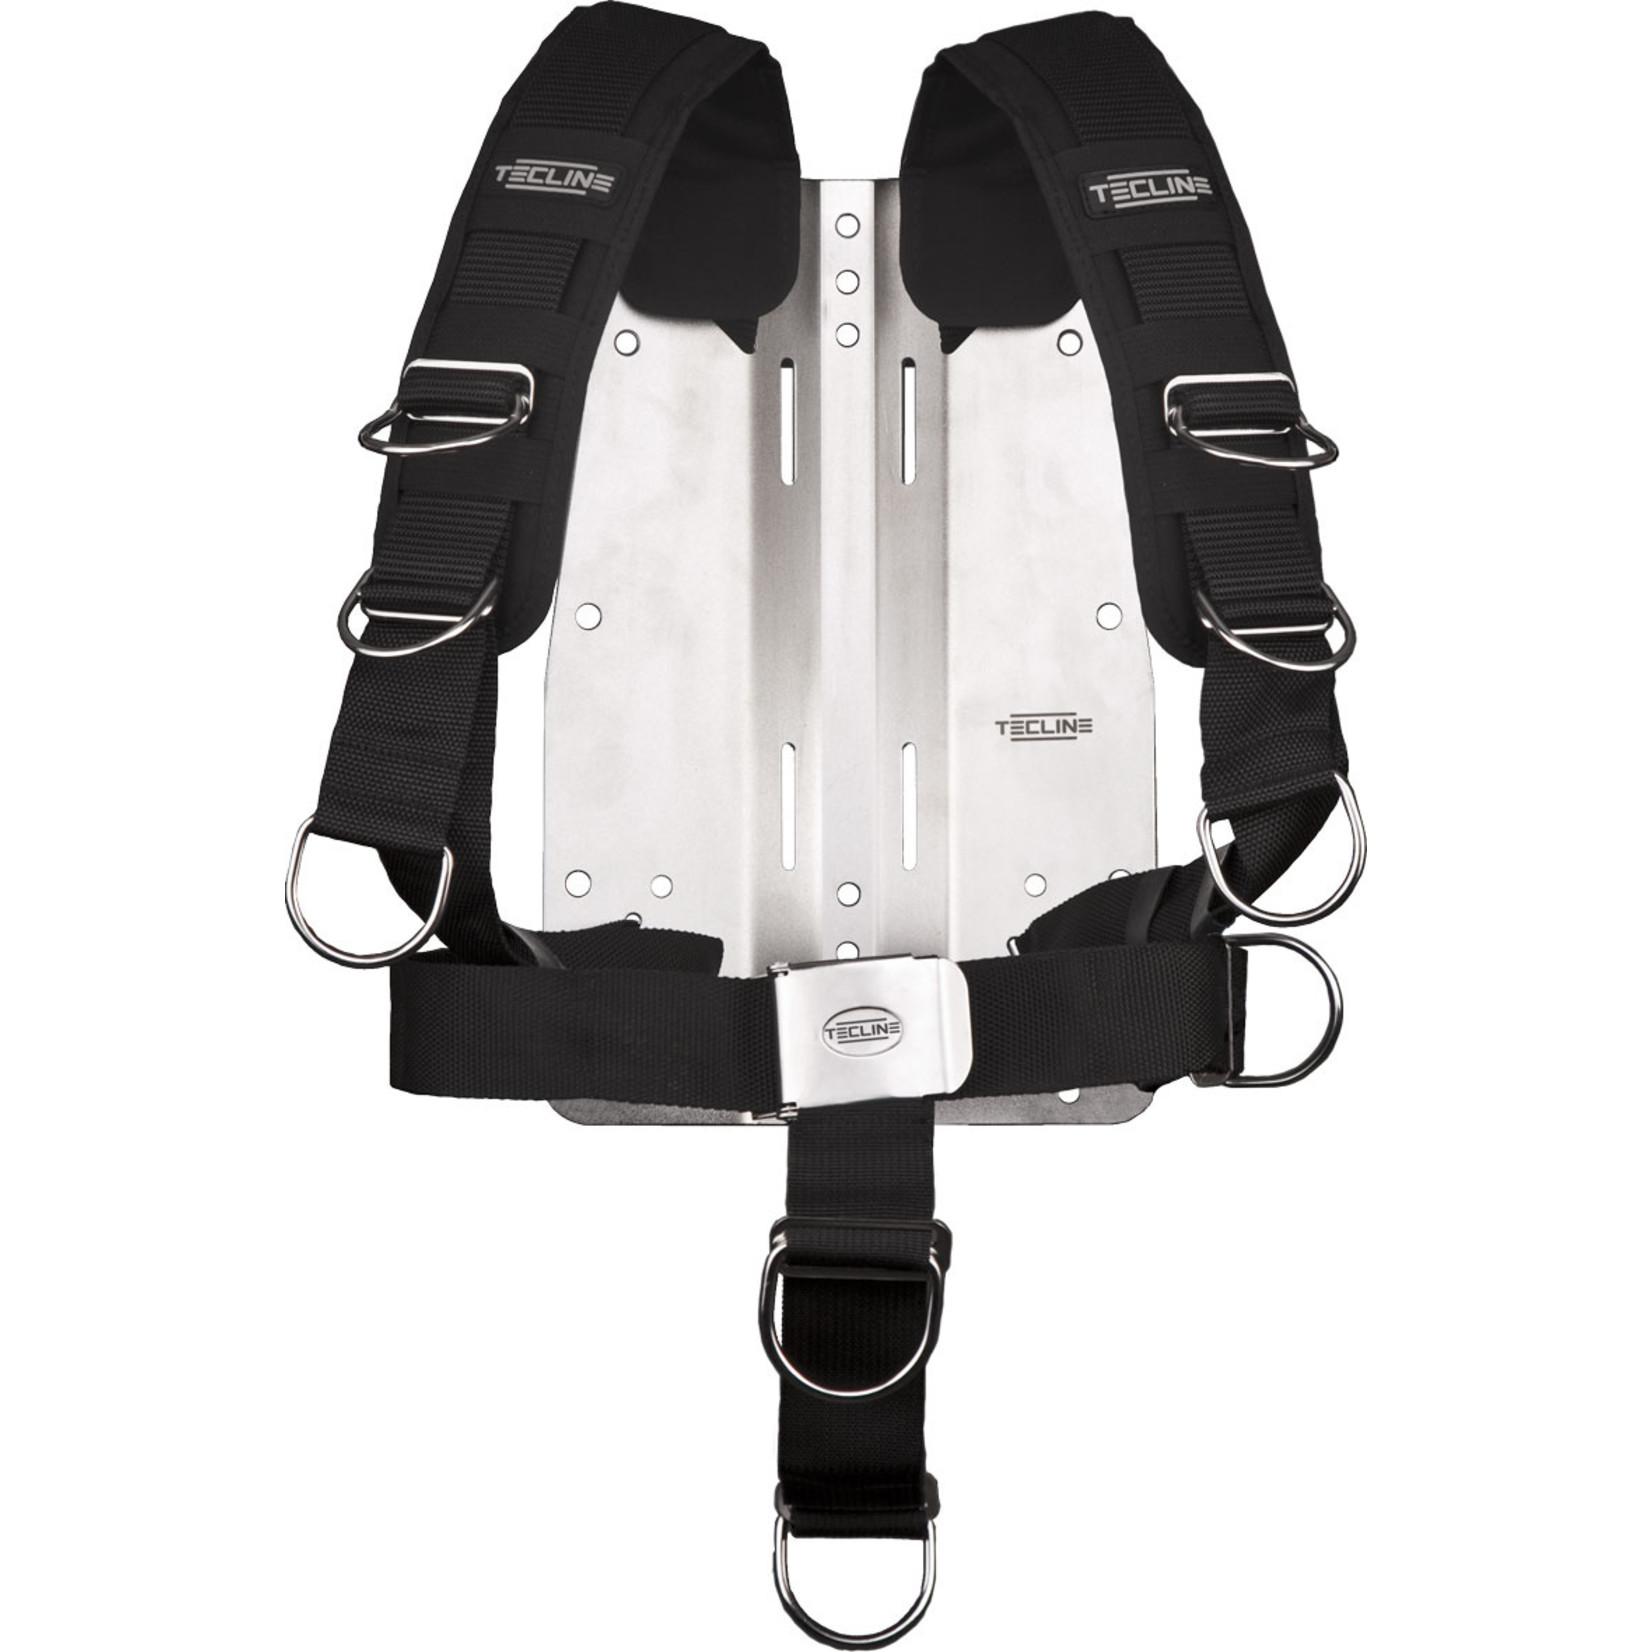 Tecline Harness TecLine Comfort (adjustable) standard webbing - incl. 6mm RVS backplate